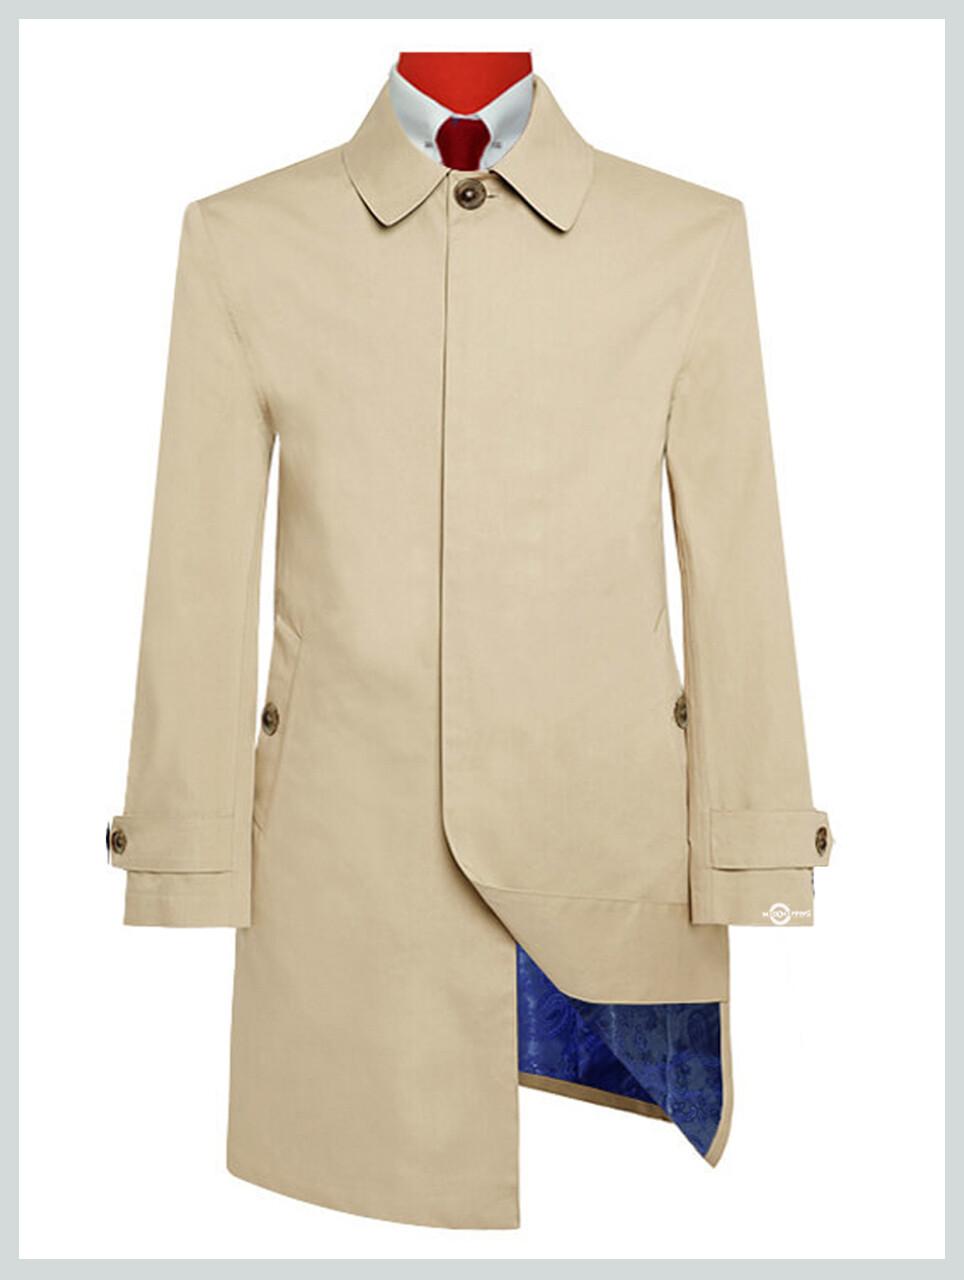 Mac Coat Mens| Mod Style Cotton Twill Beige Colour Mac Coat